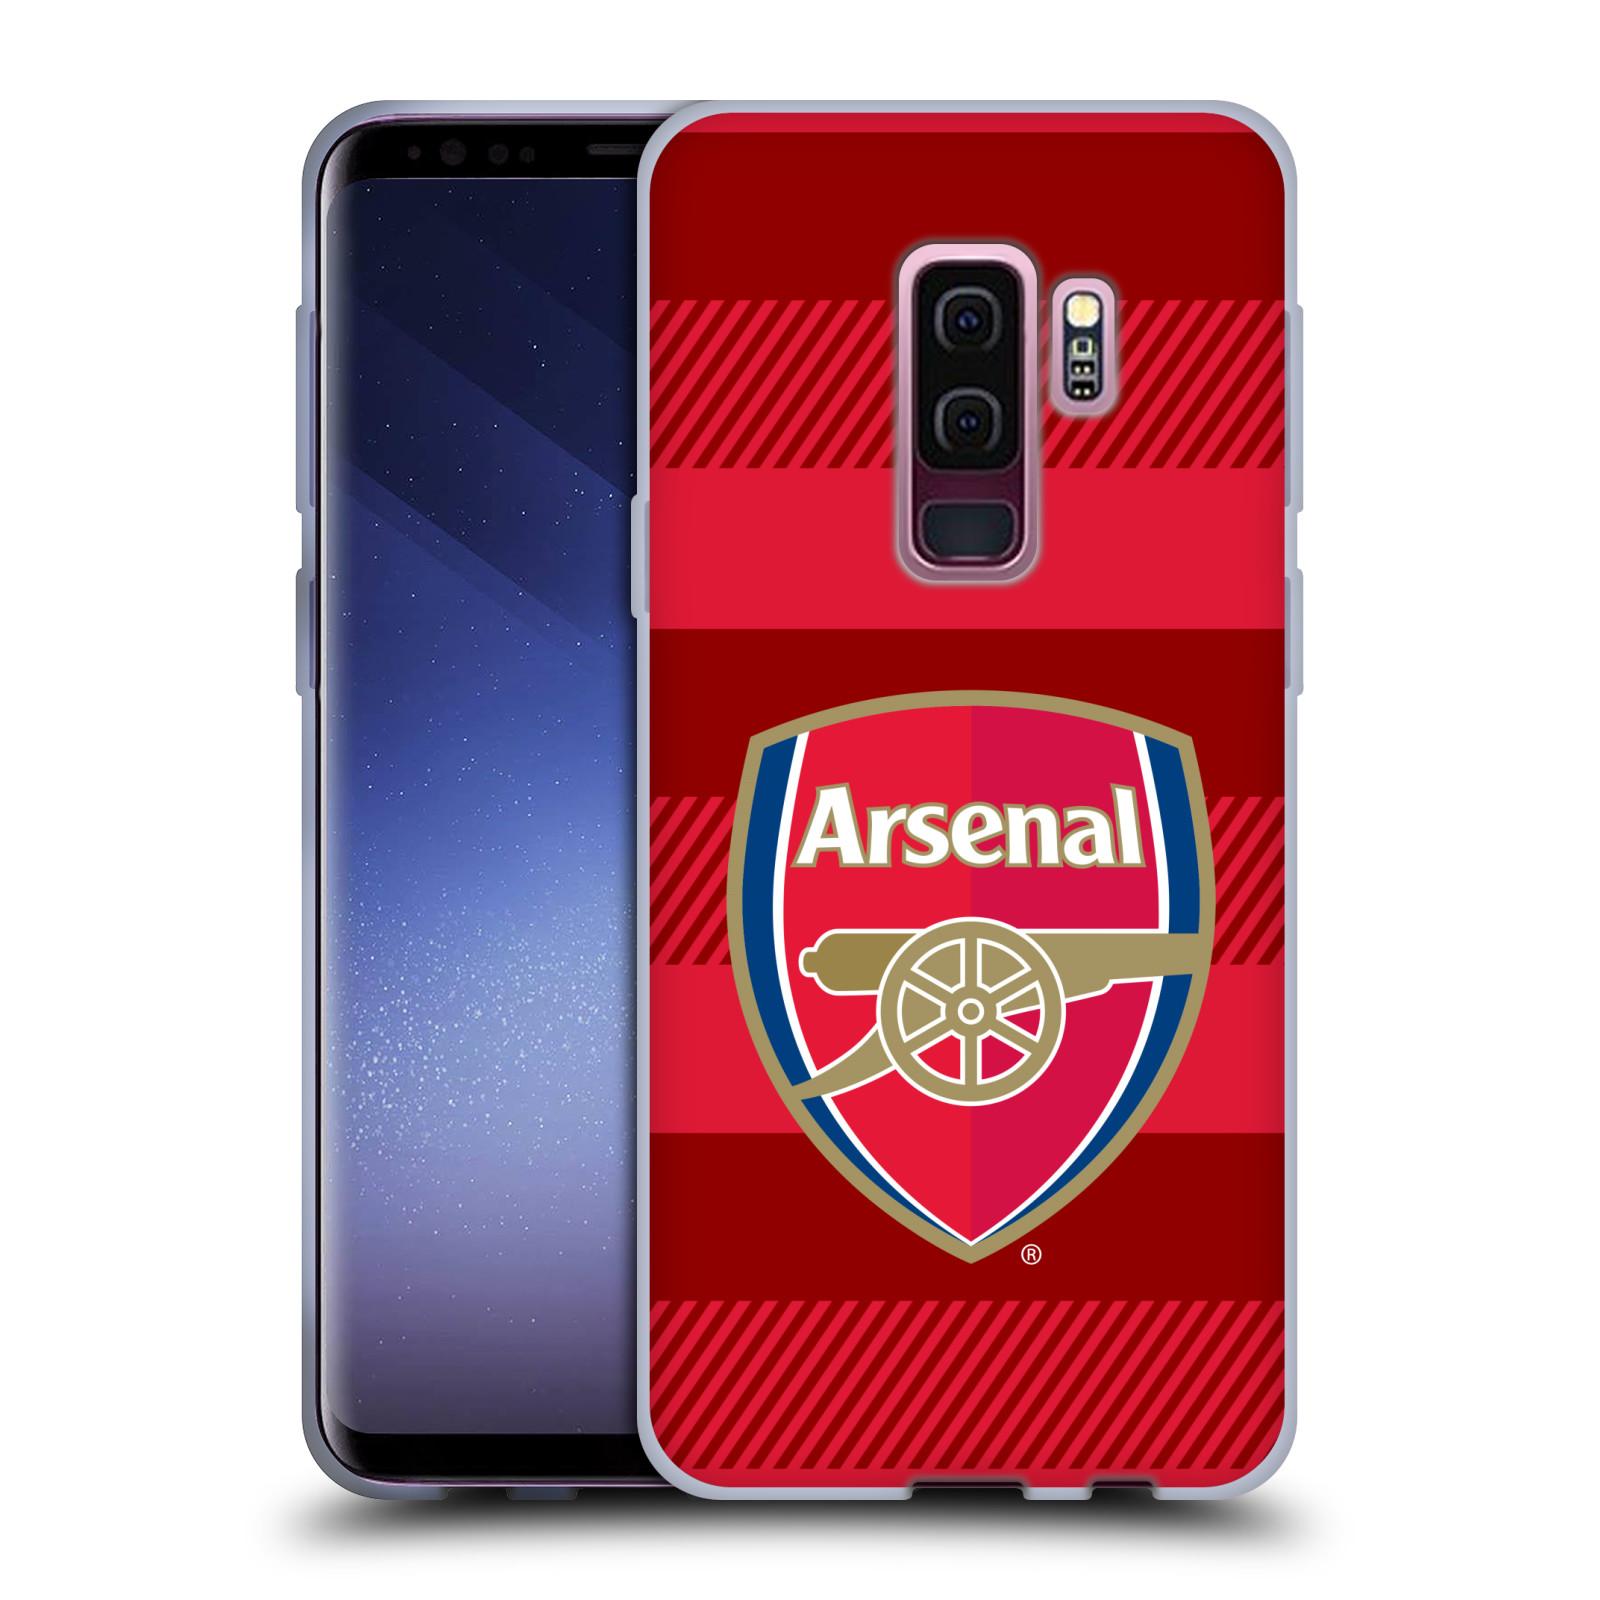 Silikonové pouzdro na mobil Samsung Galaxy S9 Plus - Head Case - Arsenal FC - Logo s pruhy